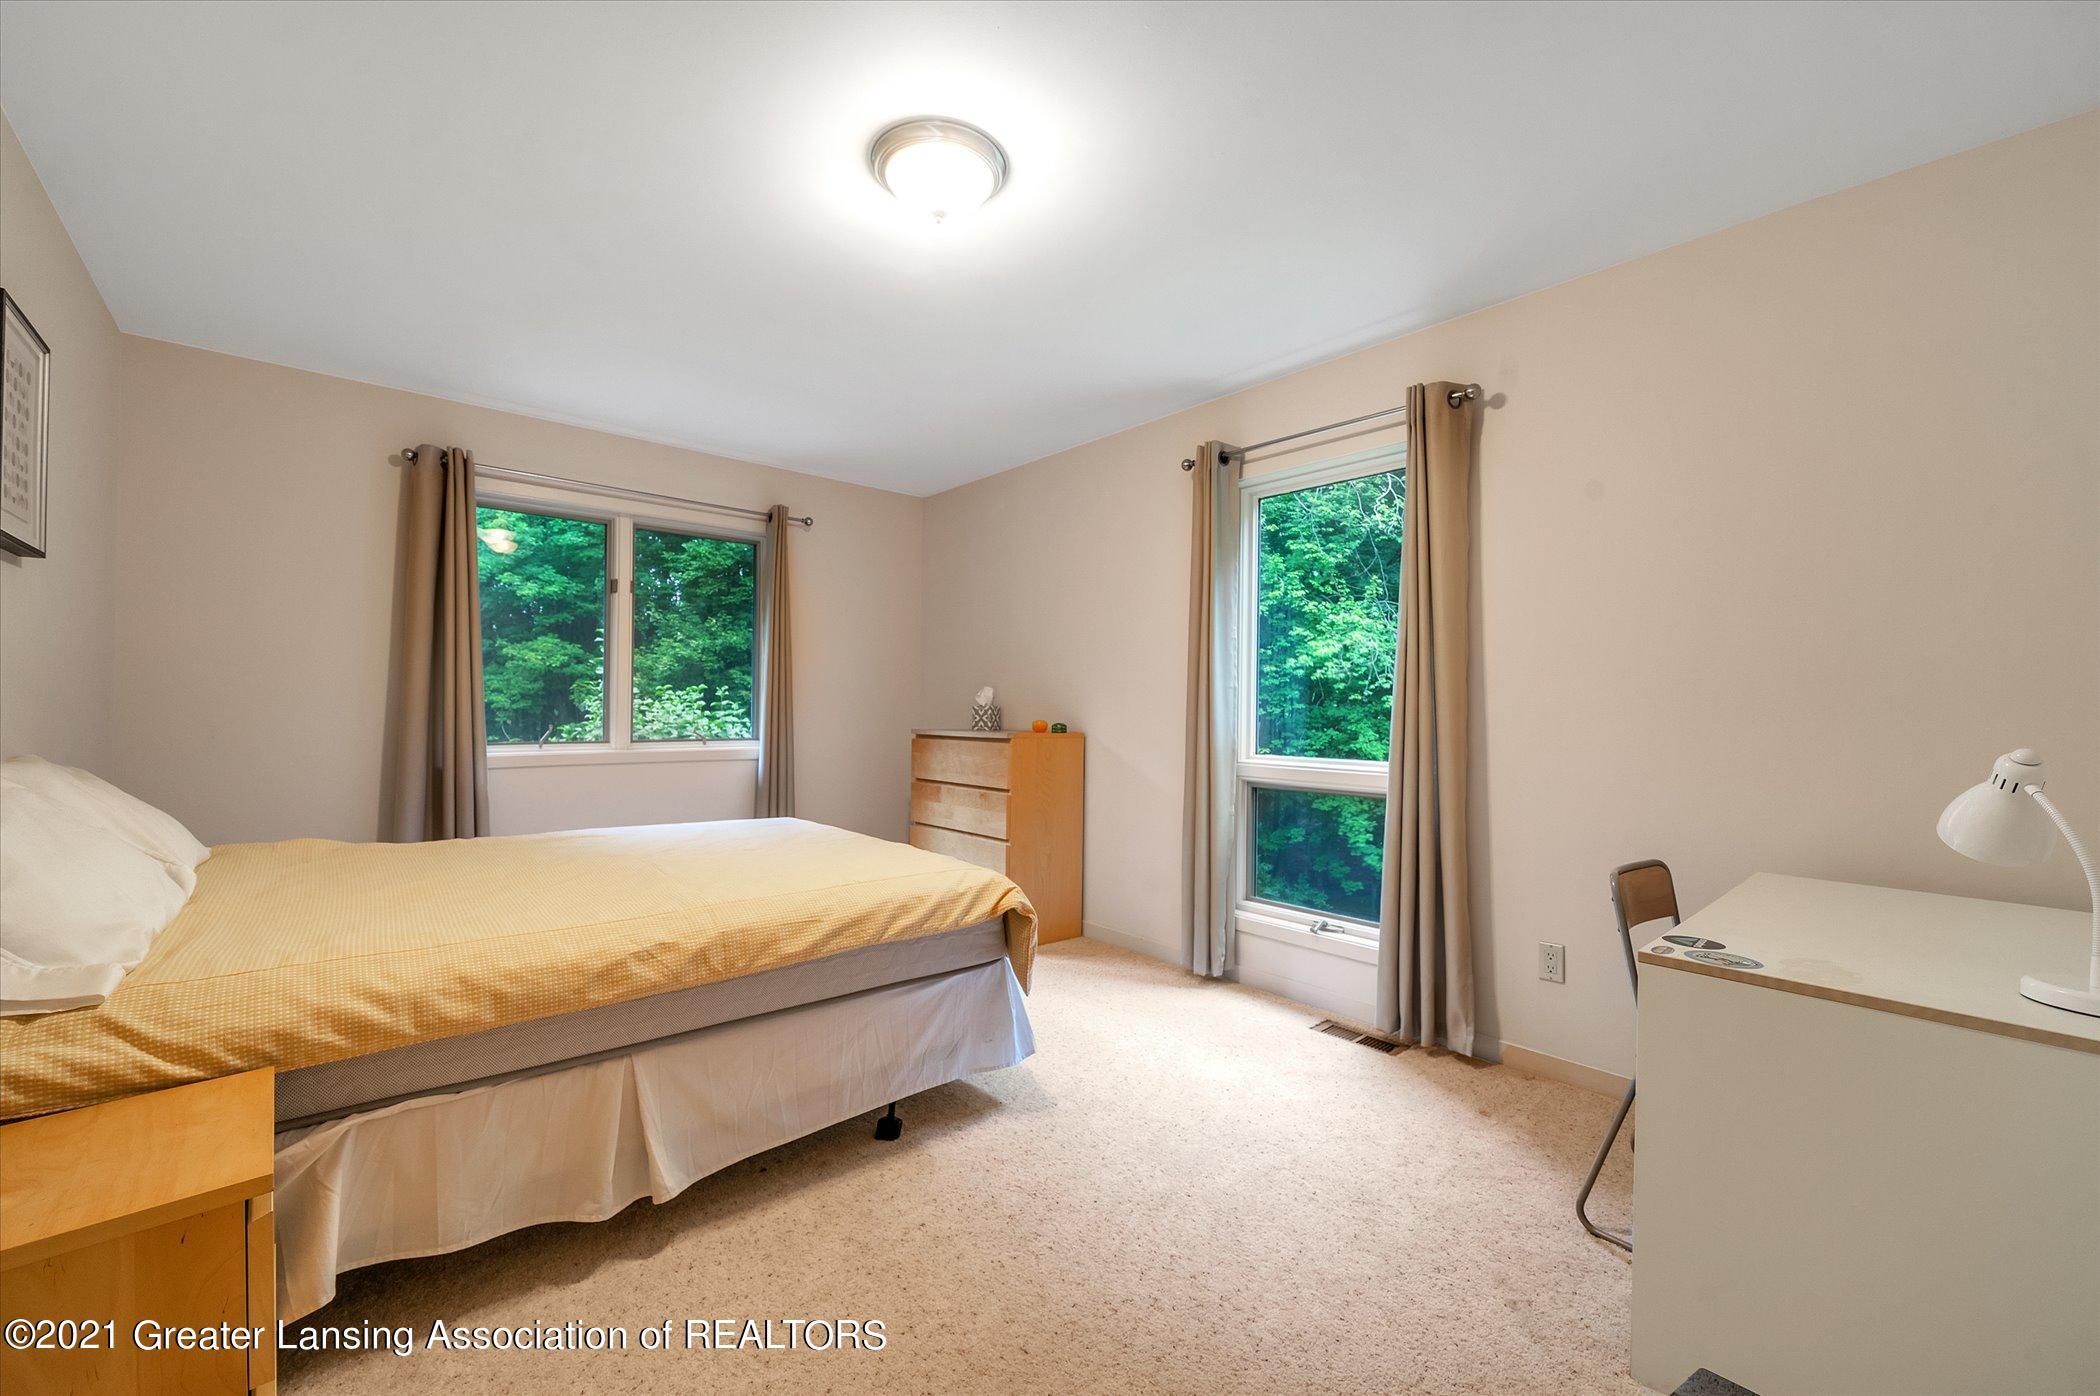 442 Shoesmith Rd - (22) UPPER LEVEL Bedroom 2 - 23